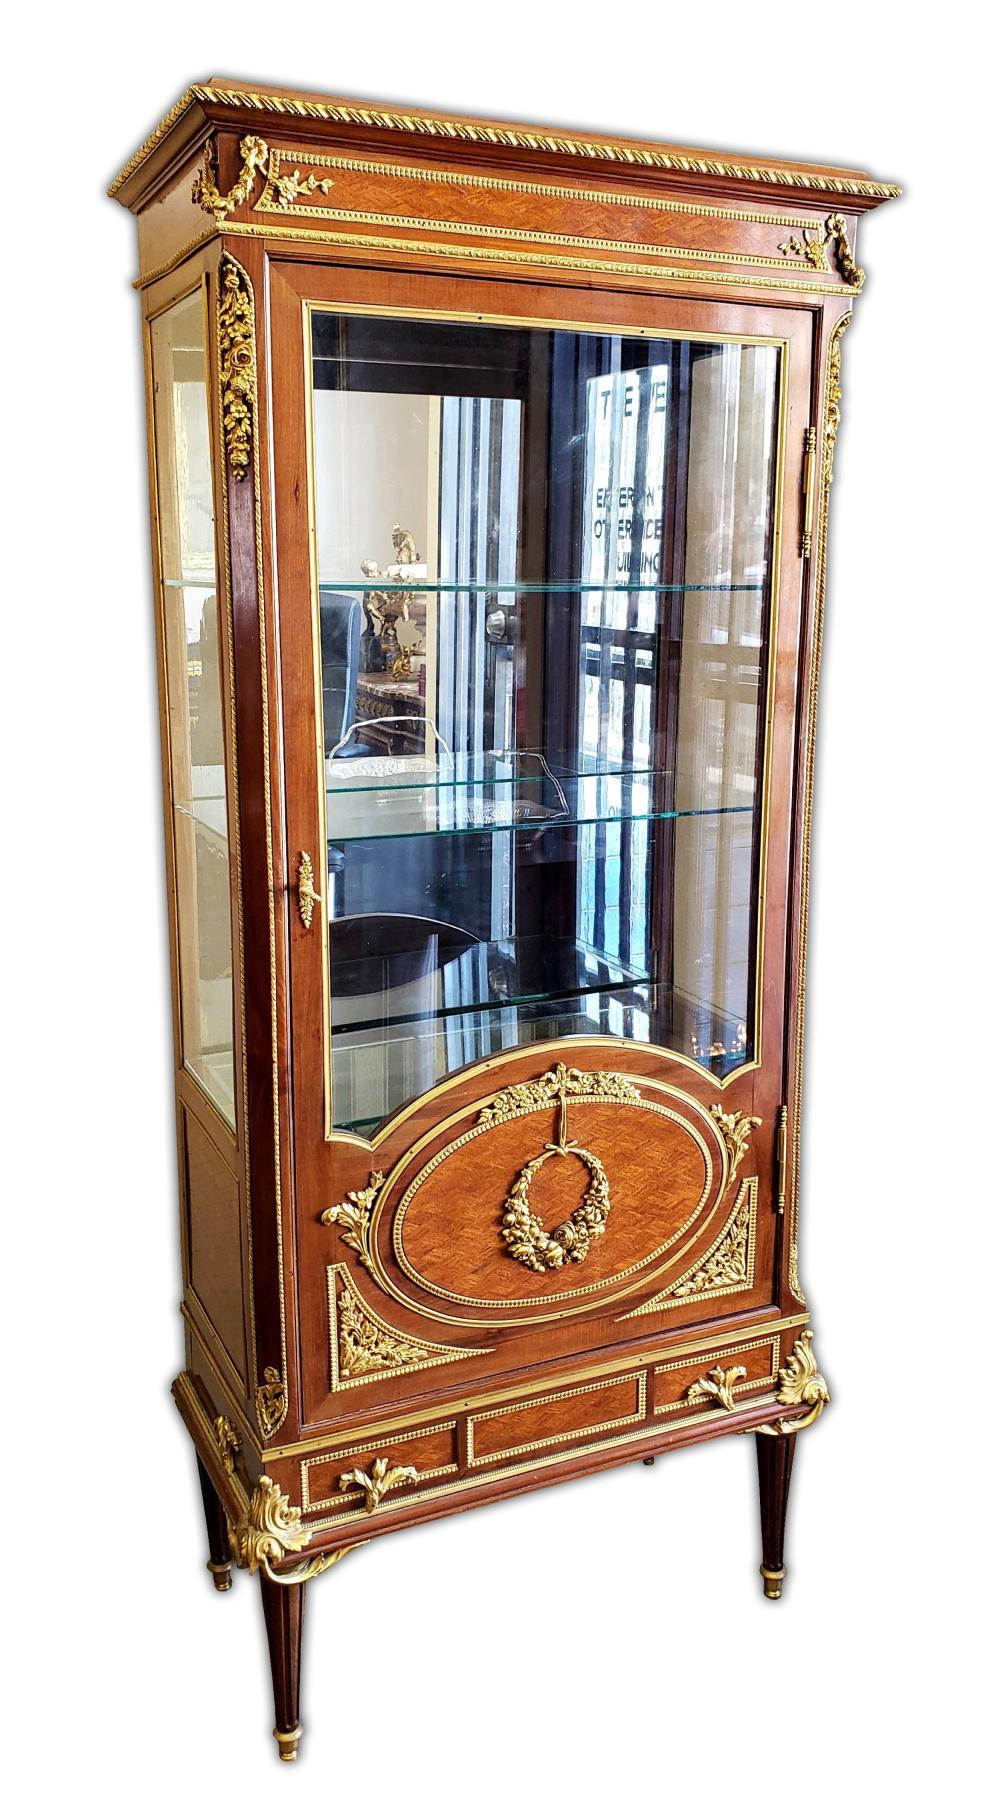 19th C. French F. Linke Att. Bronze Mounted Kingwood Vitrine Cabinet